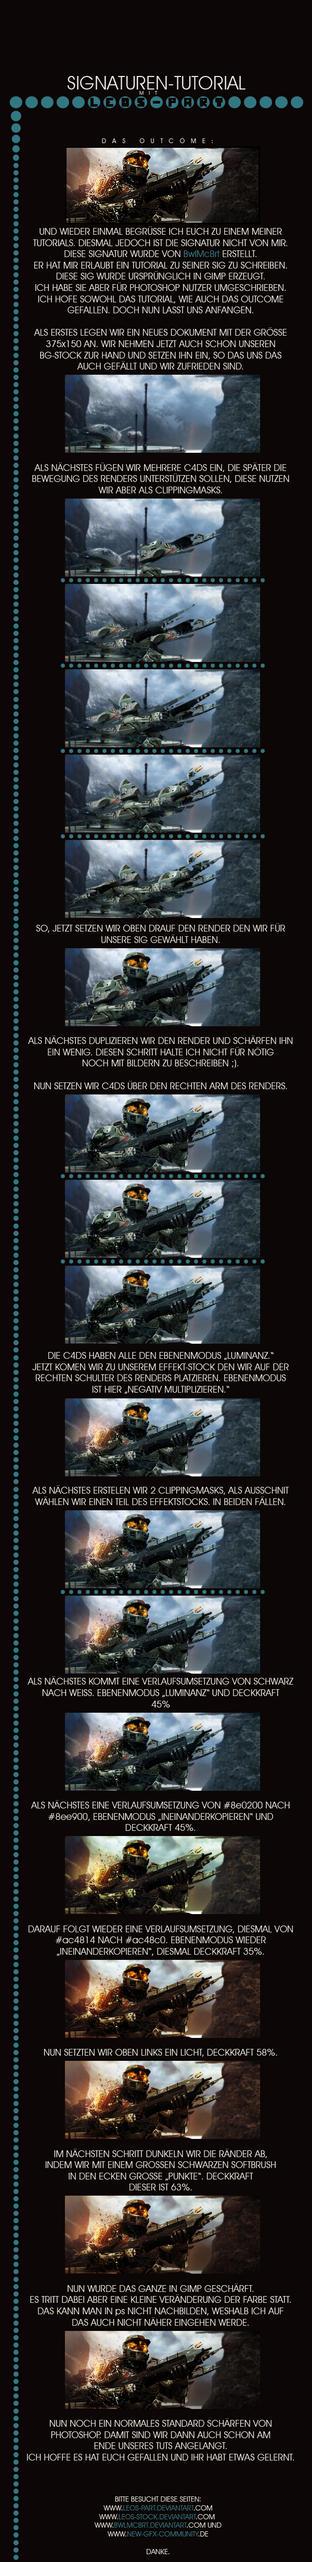 Halo Signature Tutorial by LEOs-stock